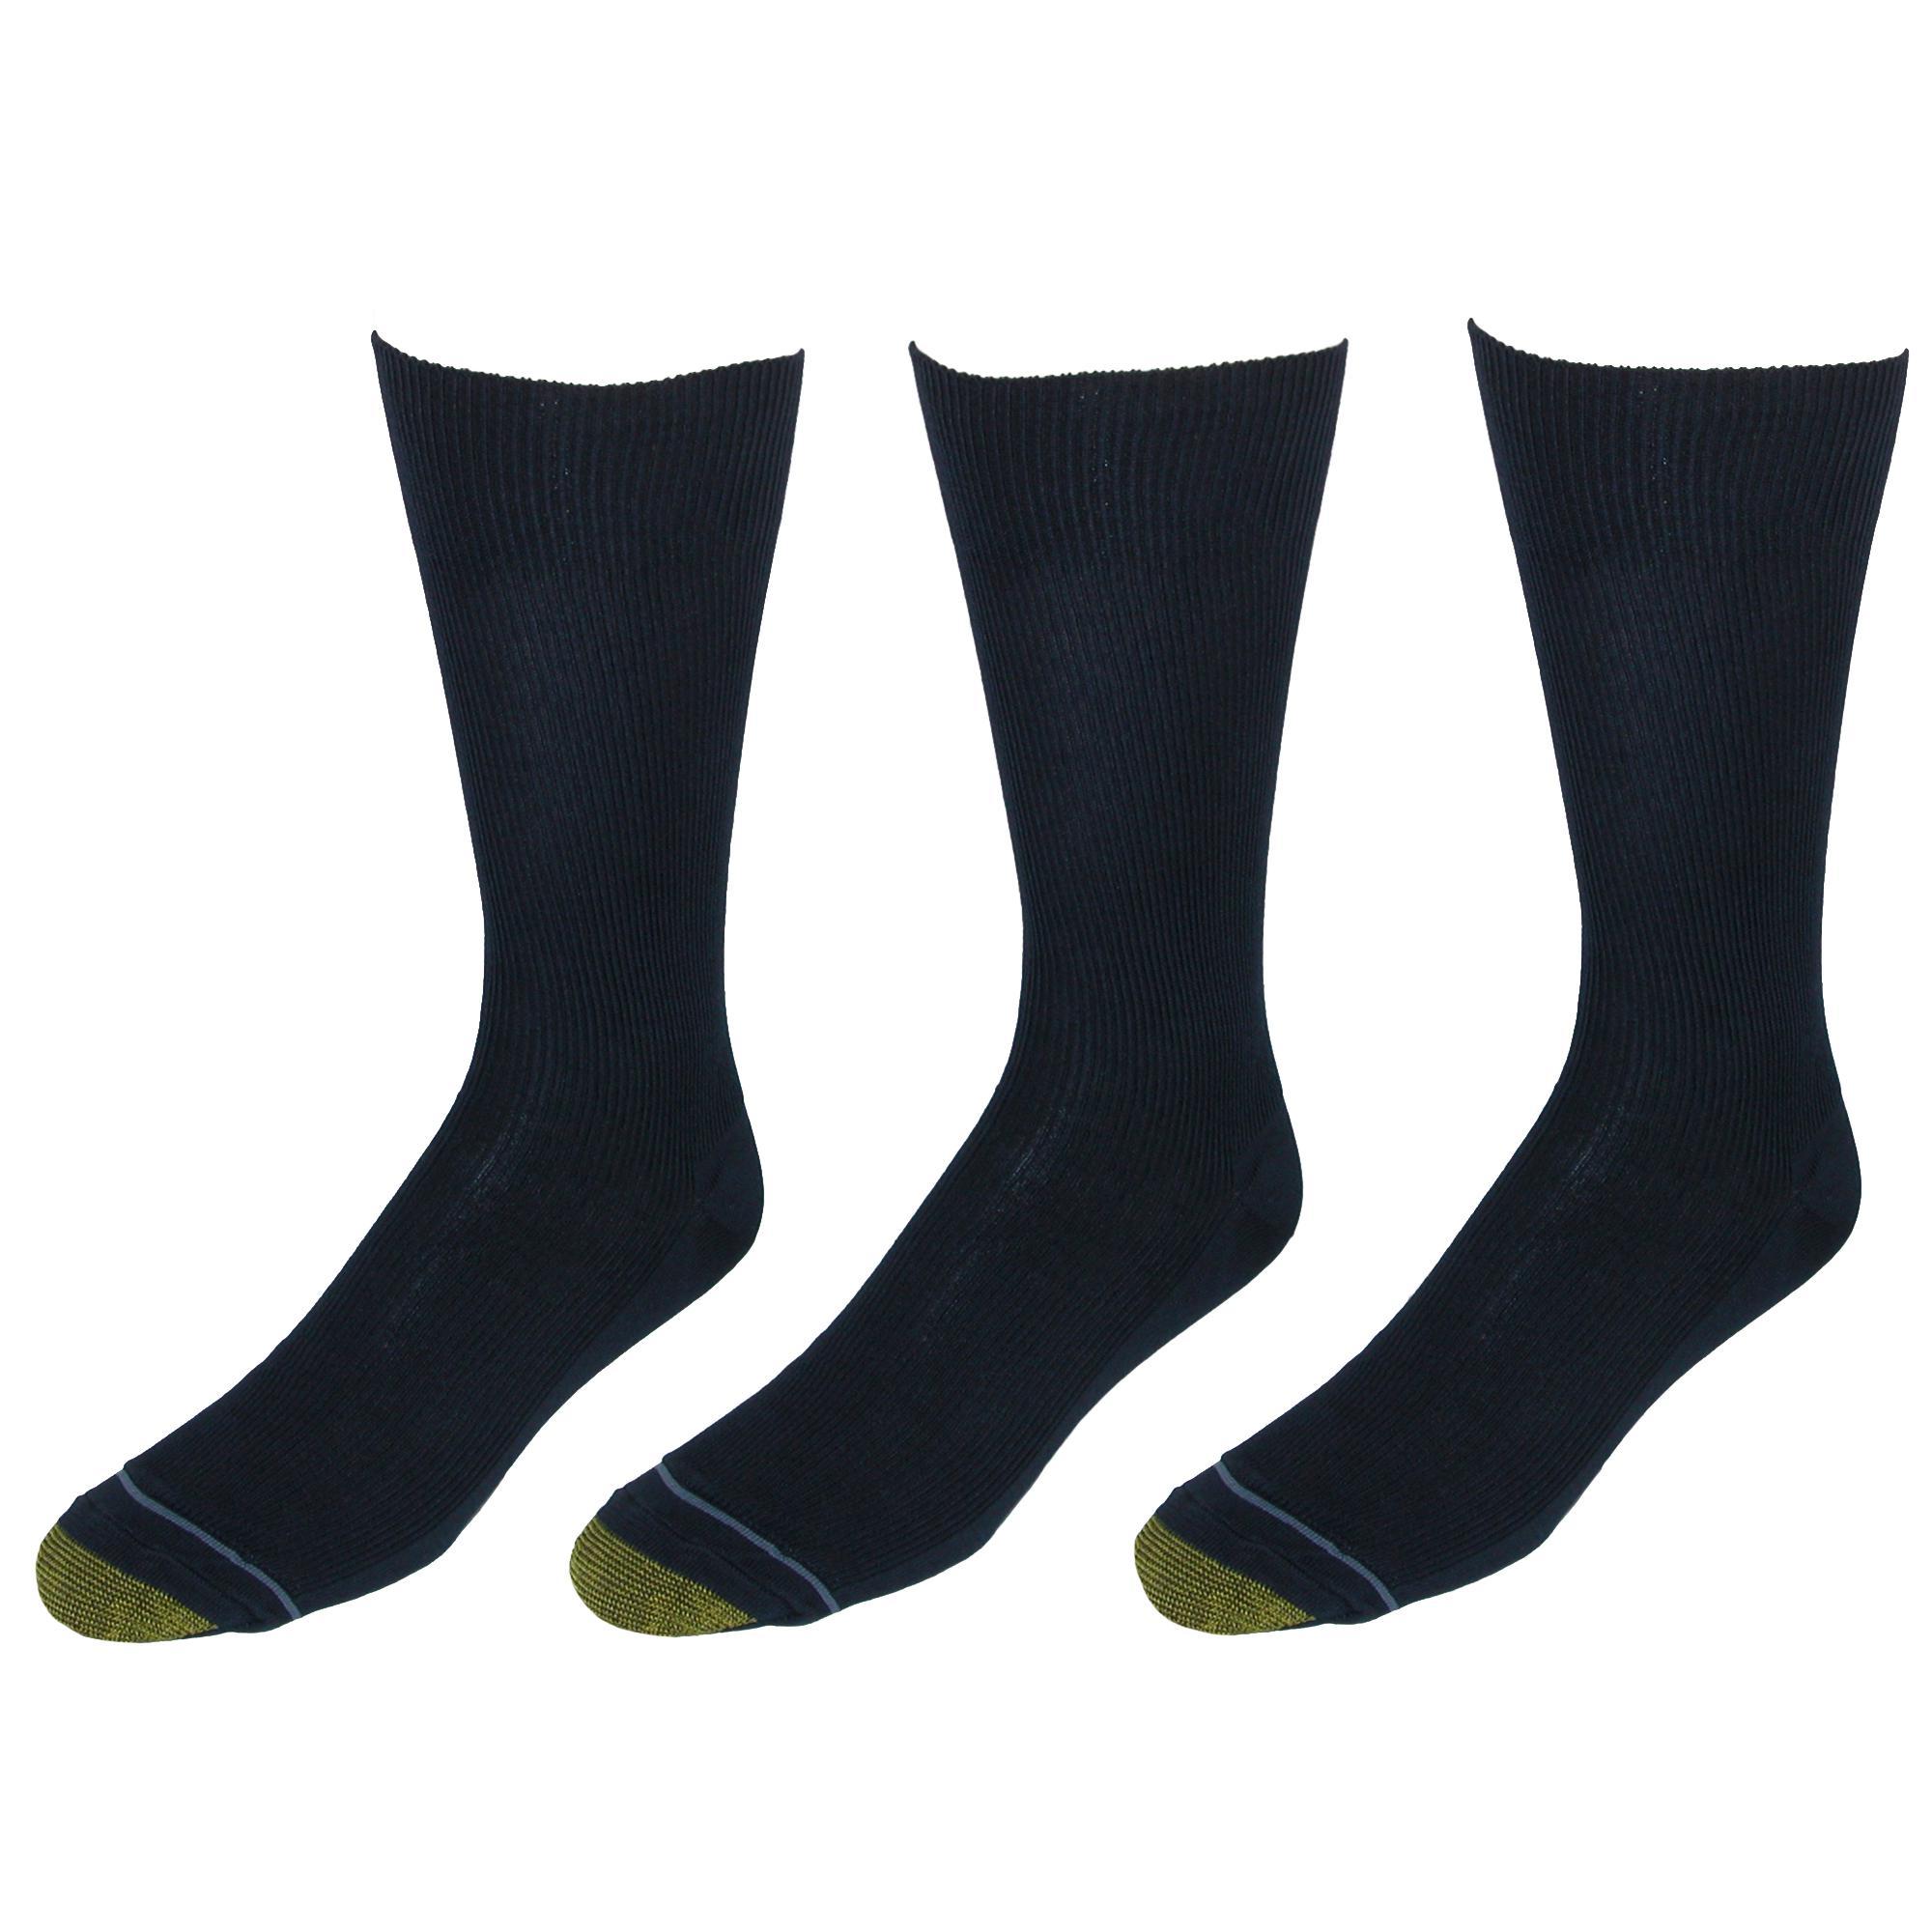 New-Gold-Toe-Men-039-s-Cotton-Moisture-Control-Metropolitan-Dress-Socks-3-Pair miniature 5